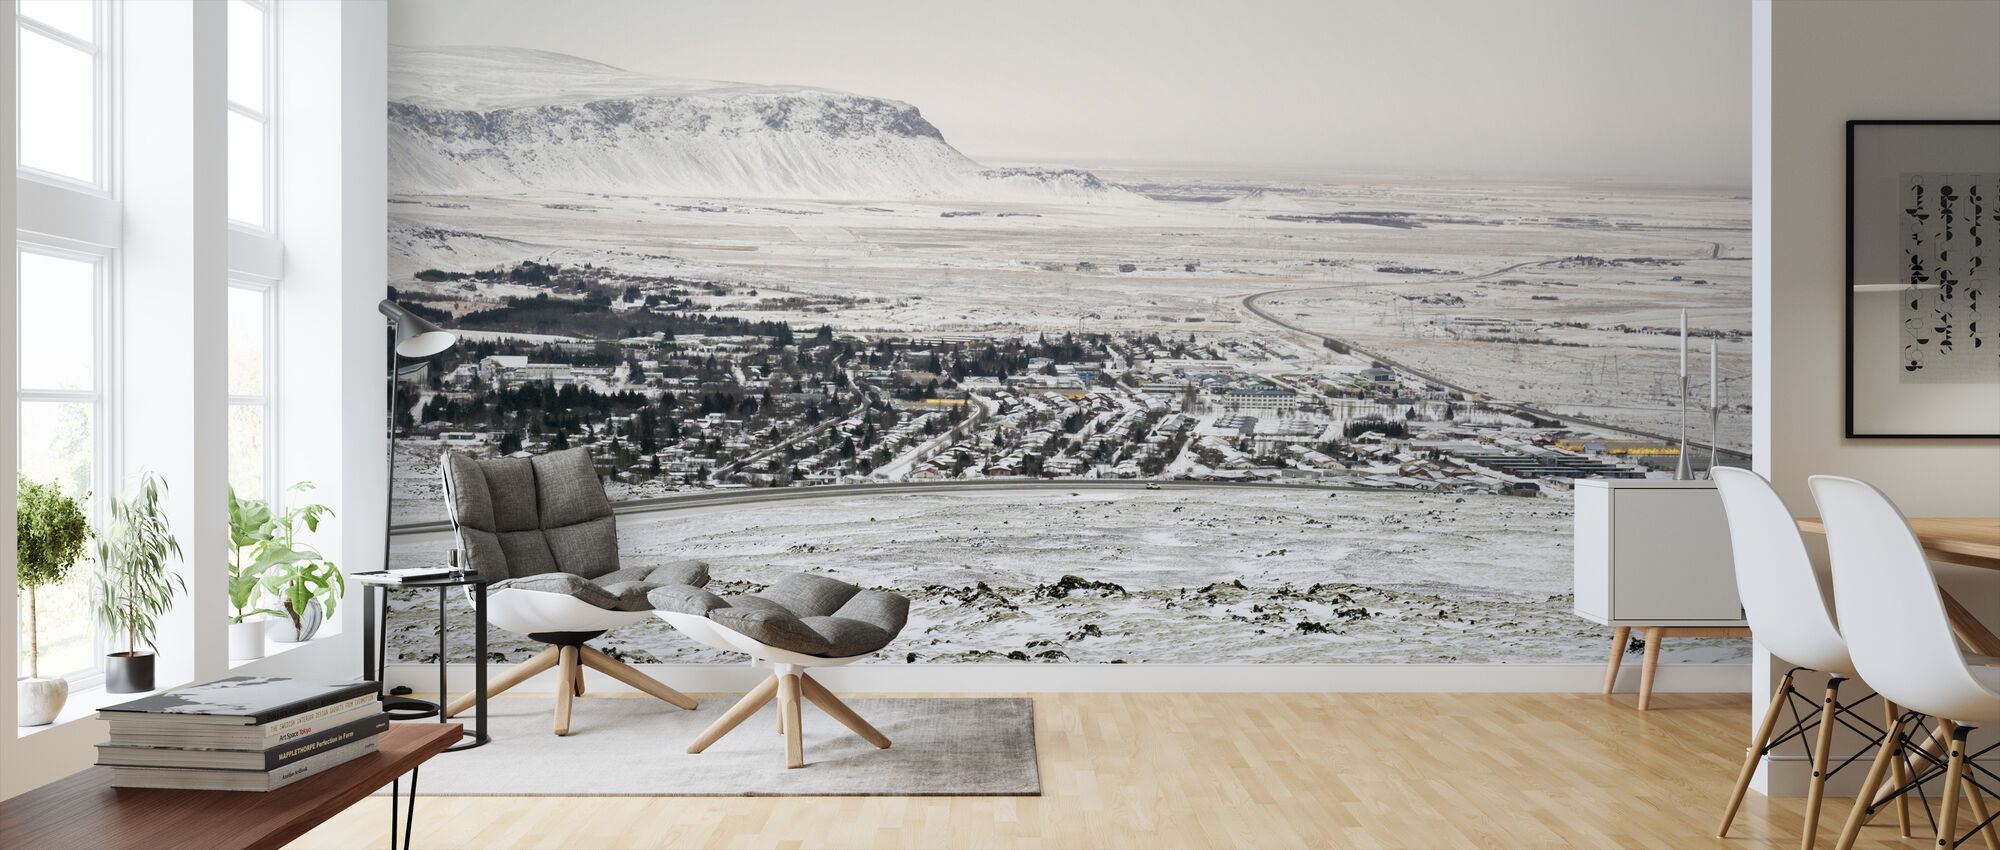 Winter Landscape in Iceland - Wallpaper - Living Room